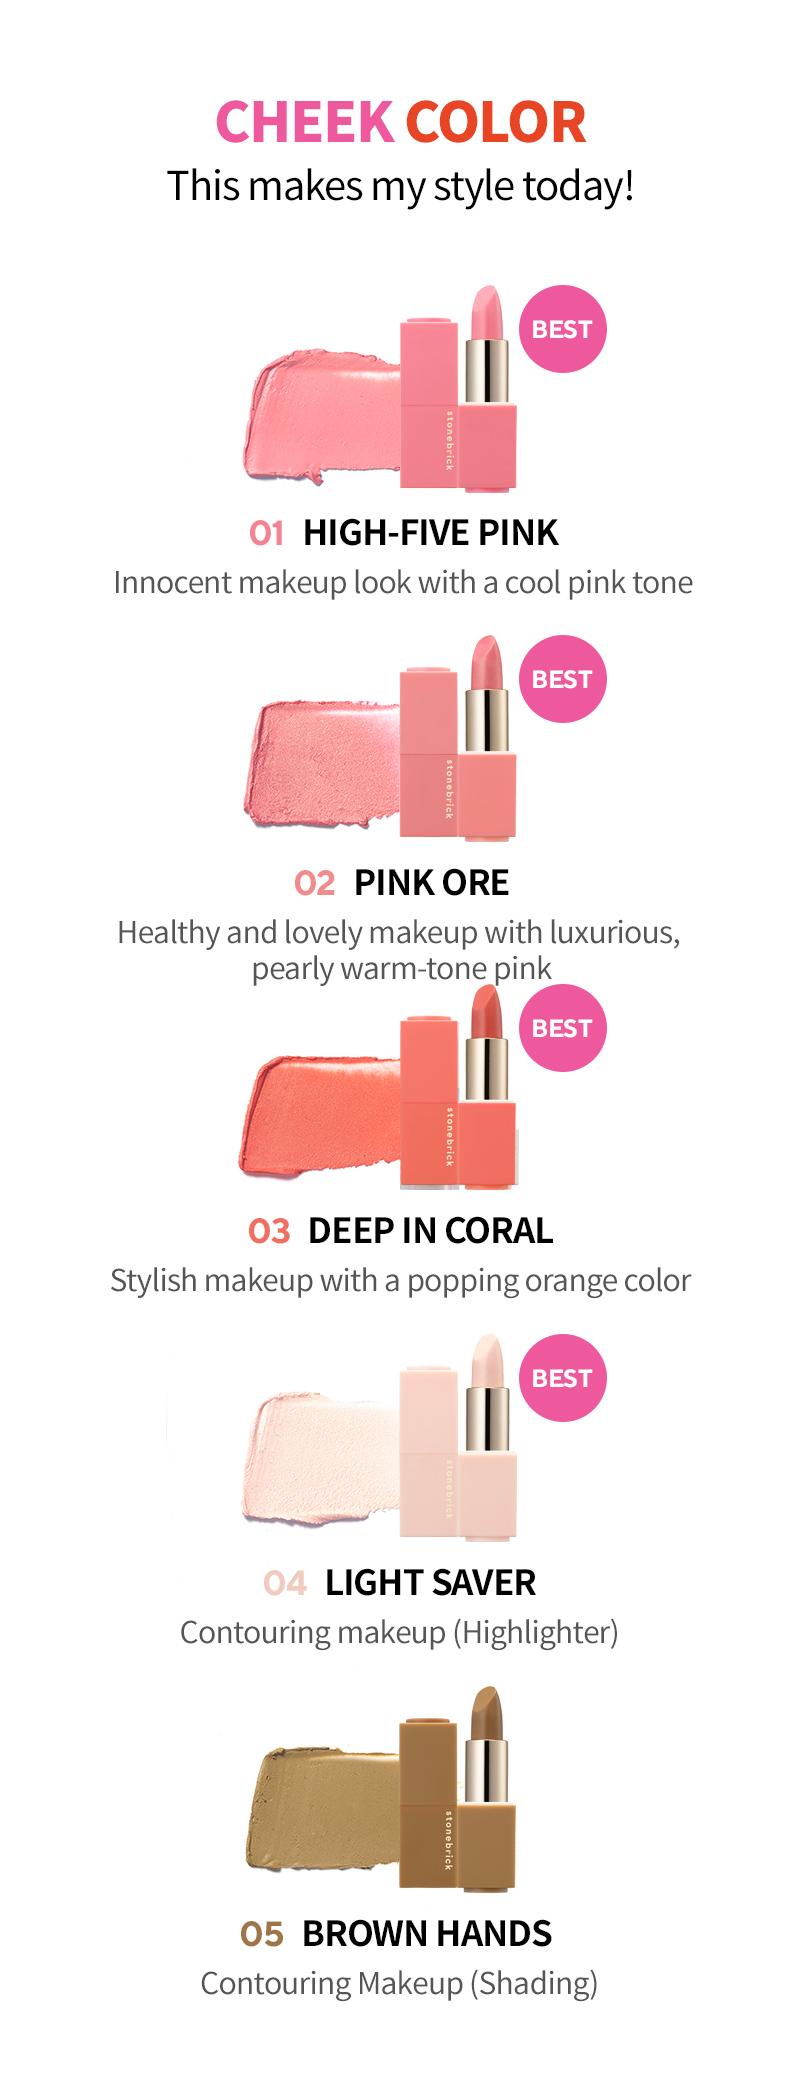 stonebrick-Cream-Blusher-Sticks-5-Colors-3-2g-Product-Description-04